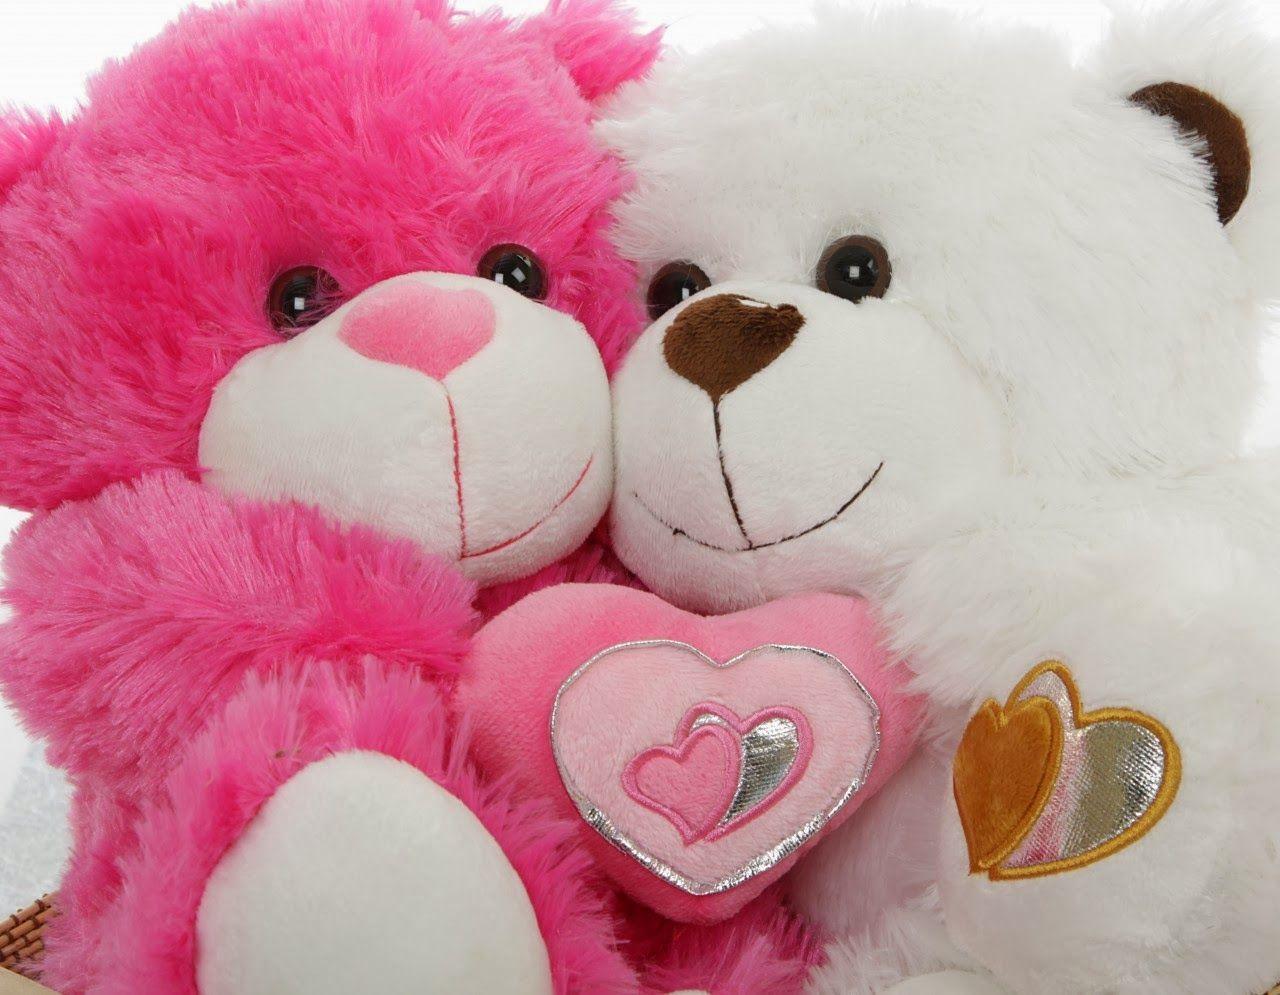 Beautiful Wallpaper Mobile Teddy Bear - 766145c2e8e5d1c88f437412a2180052  You Should Have_51875.jpg